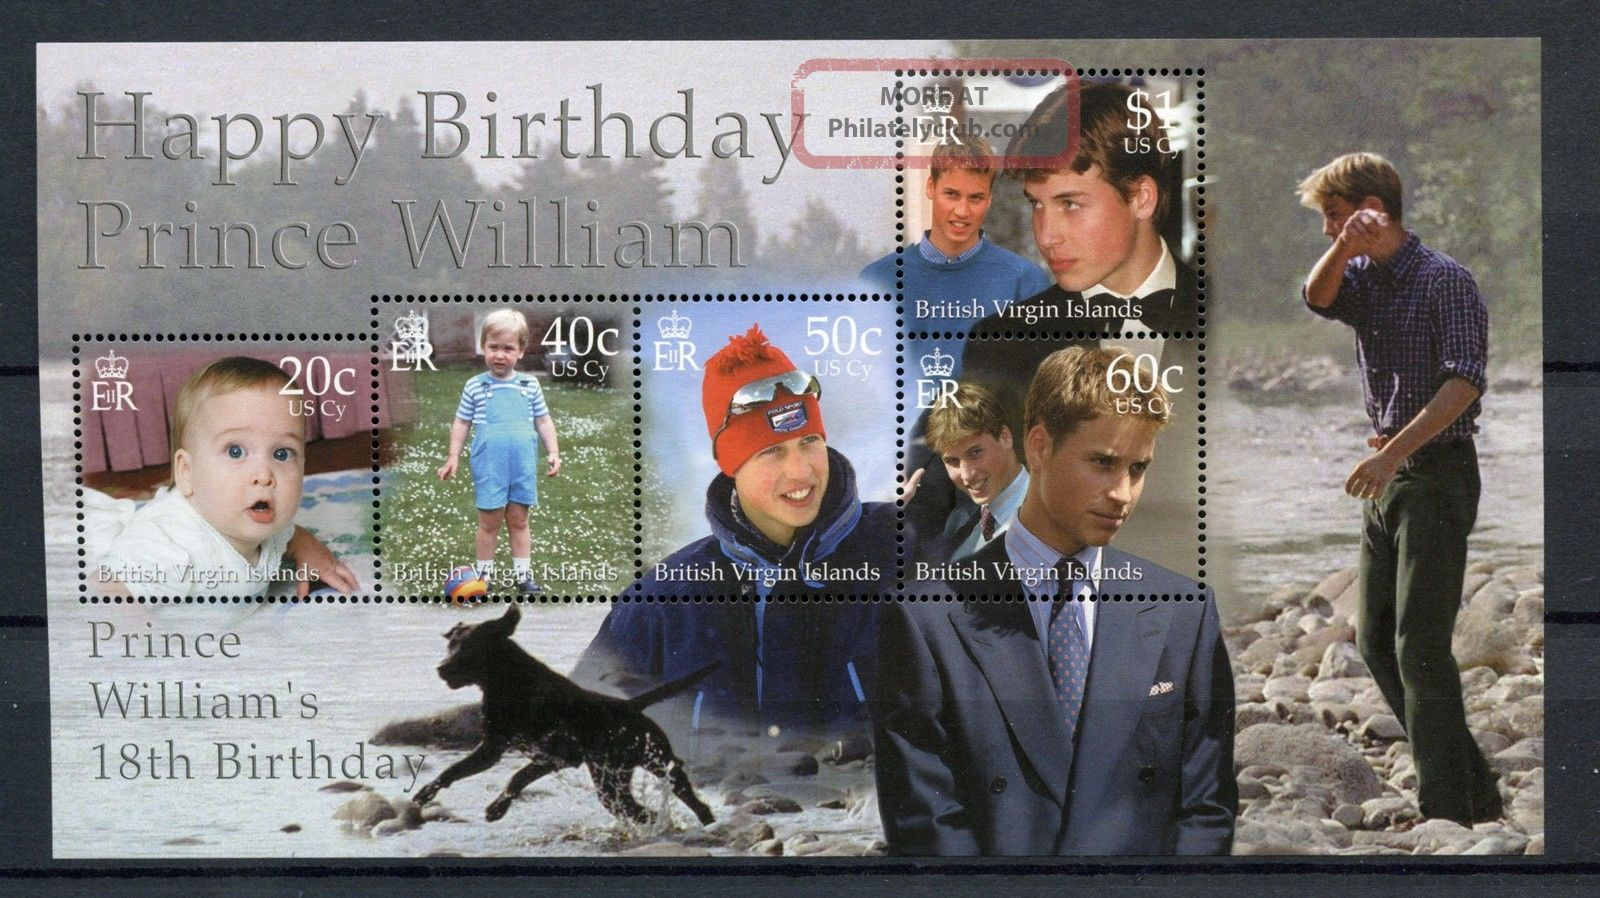 British Virgin Islands 2000 Sg Ms1046 Prince William M/s A59978 British Colonies & Territories photo